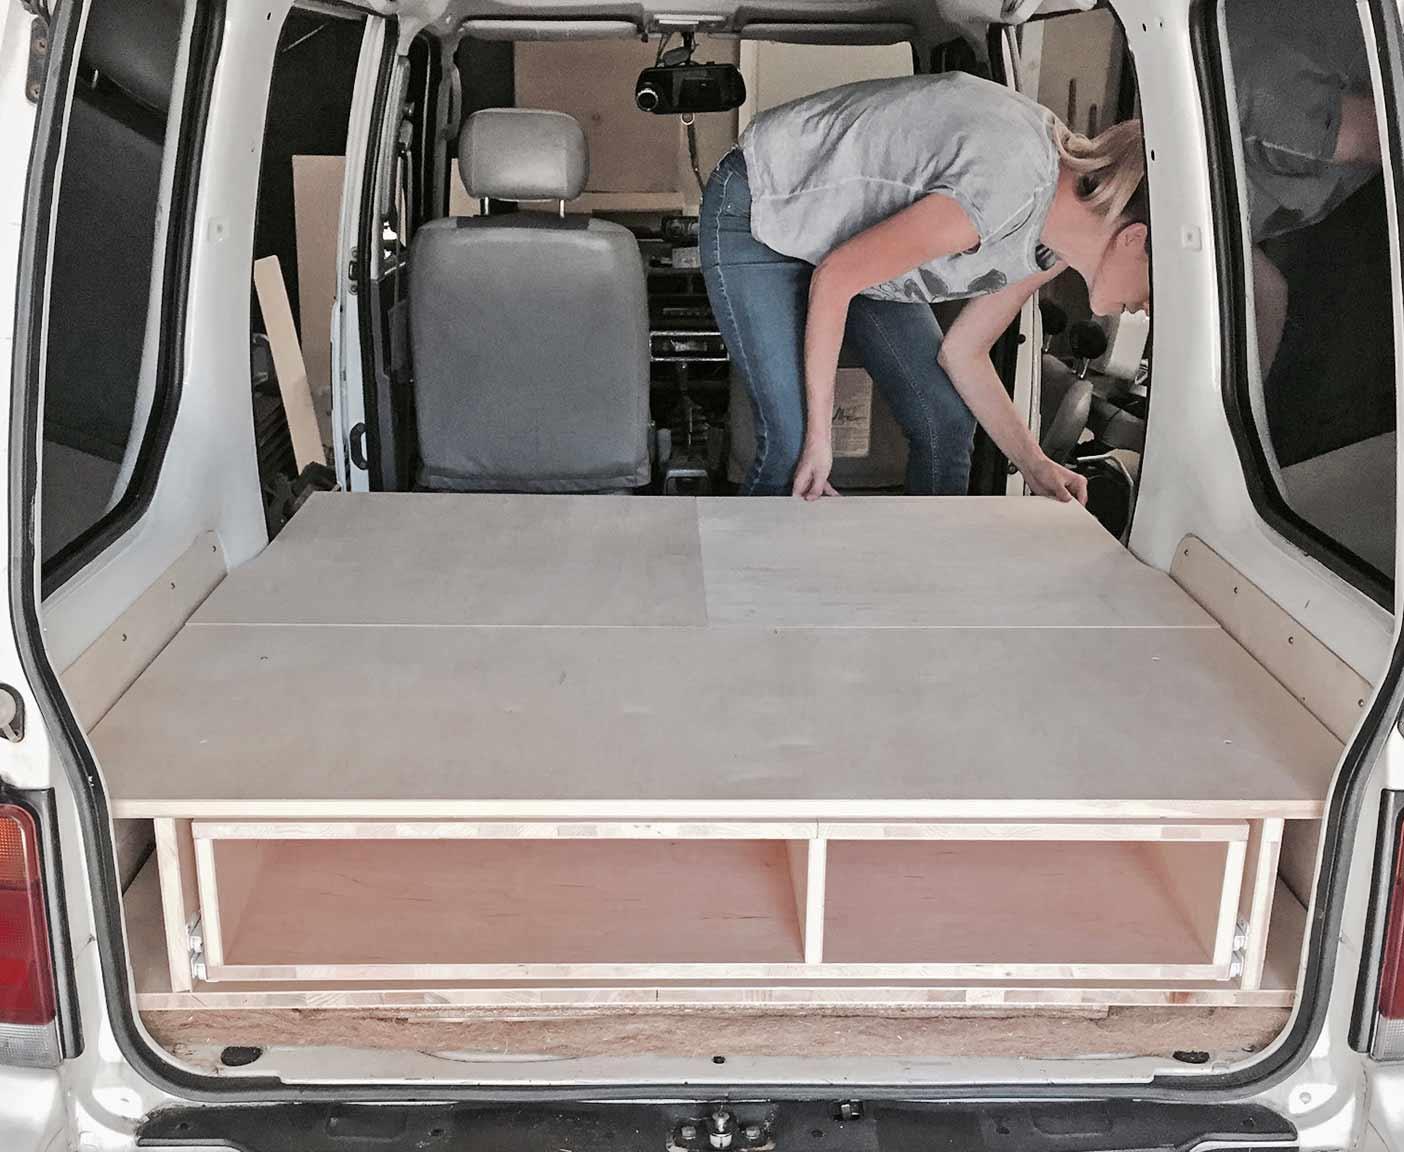 subaru-libero-wohnmobil-umbau-e10-4x4-allrad-camper-minicamper-daihatsu-hijet-piaggio-porter-12